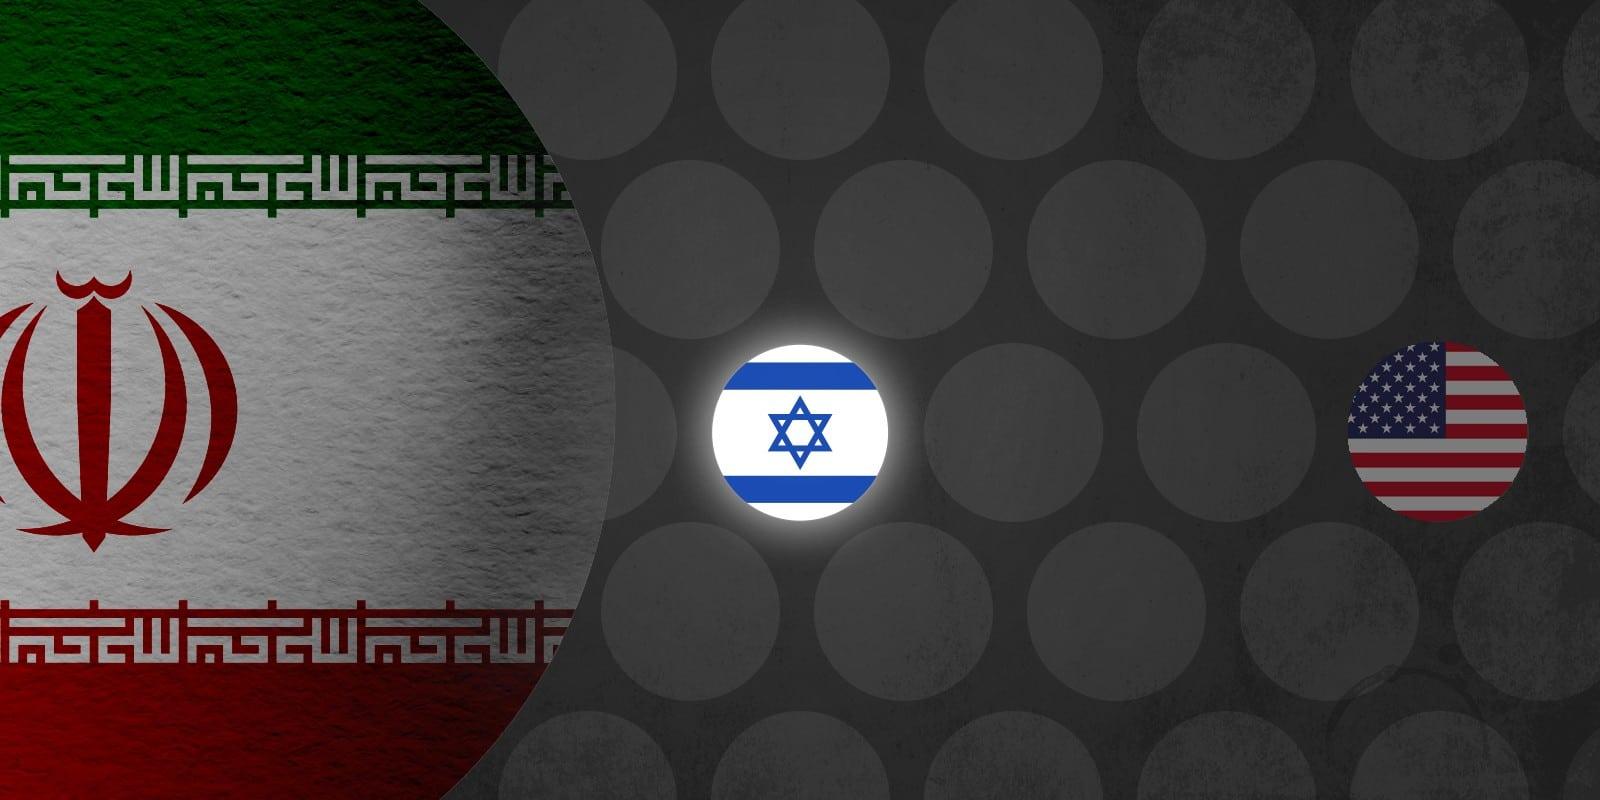 Iran, USA and Israel flags illustration